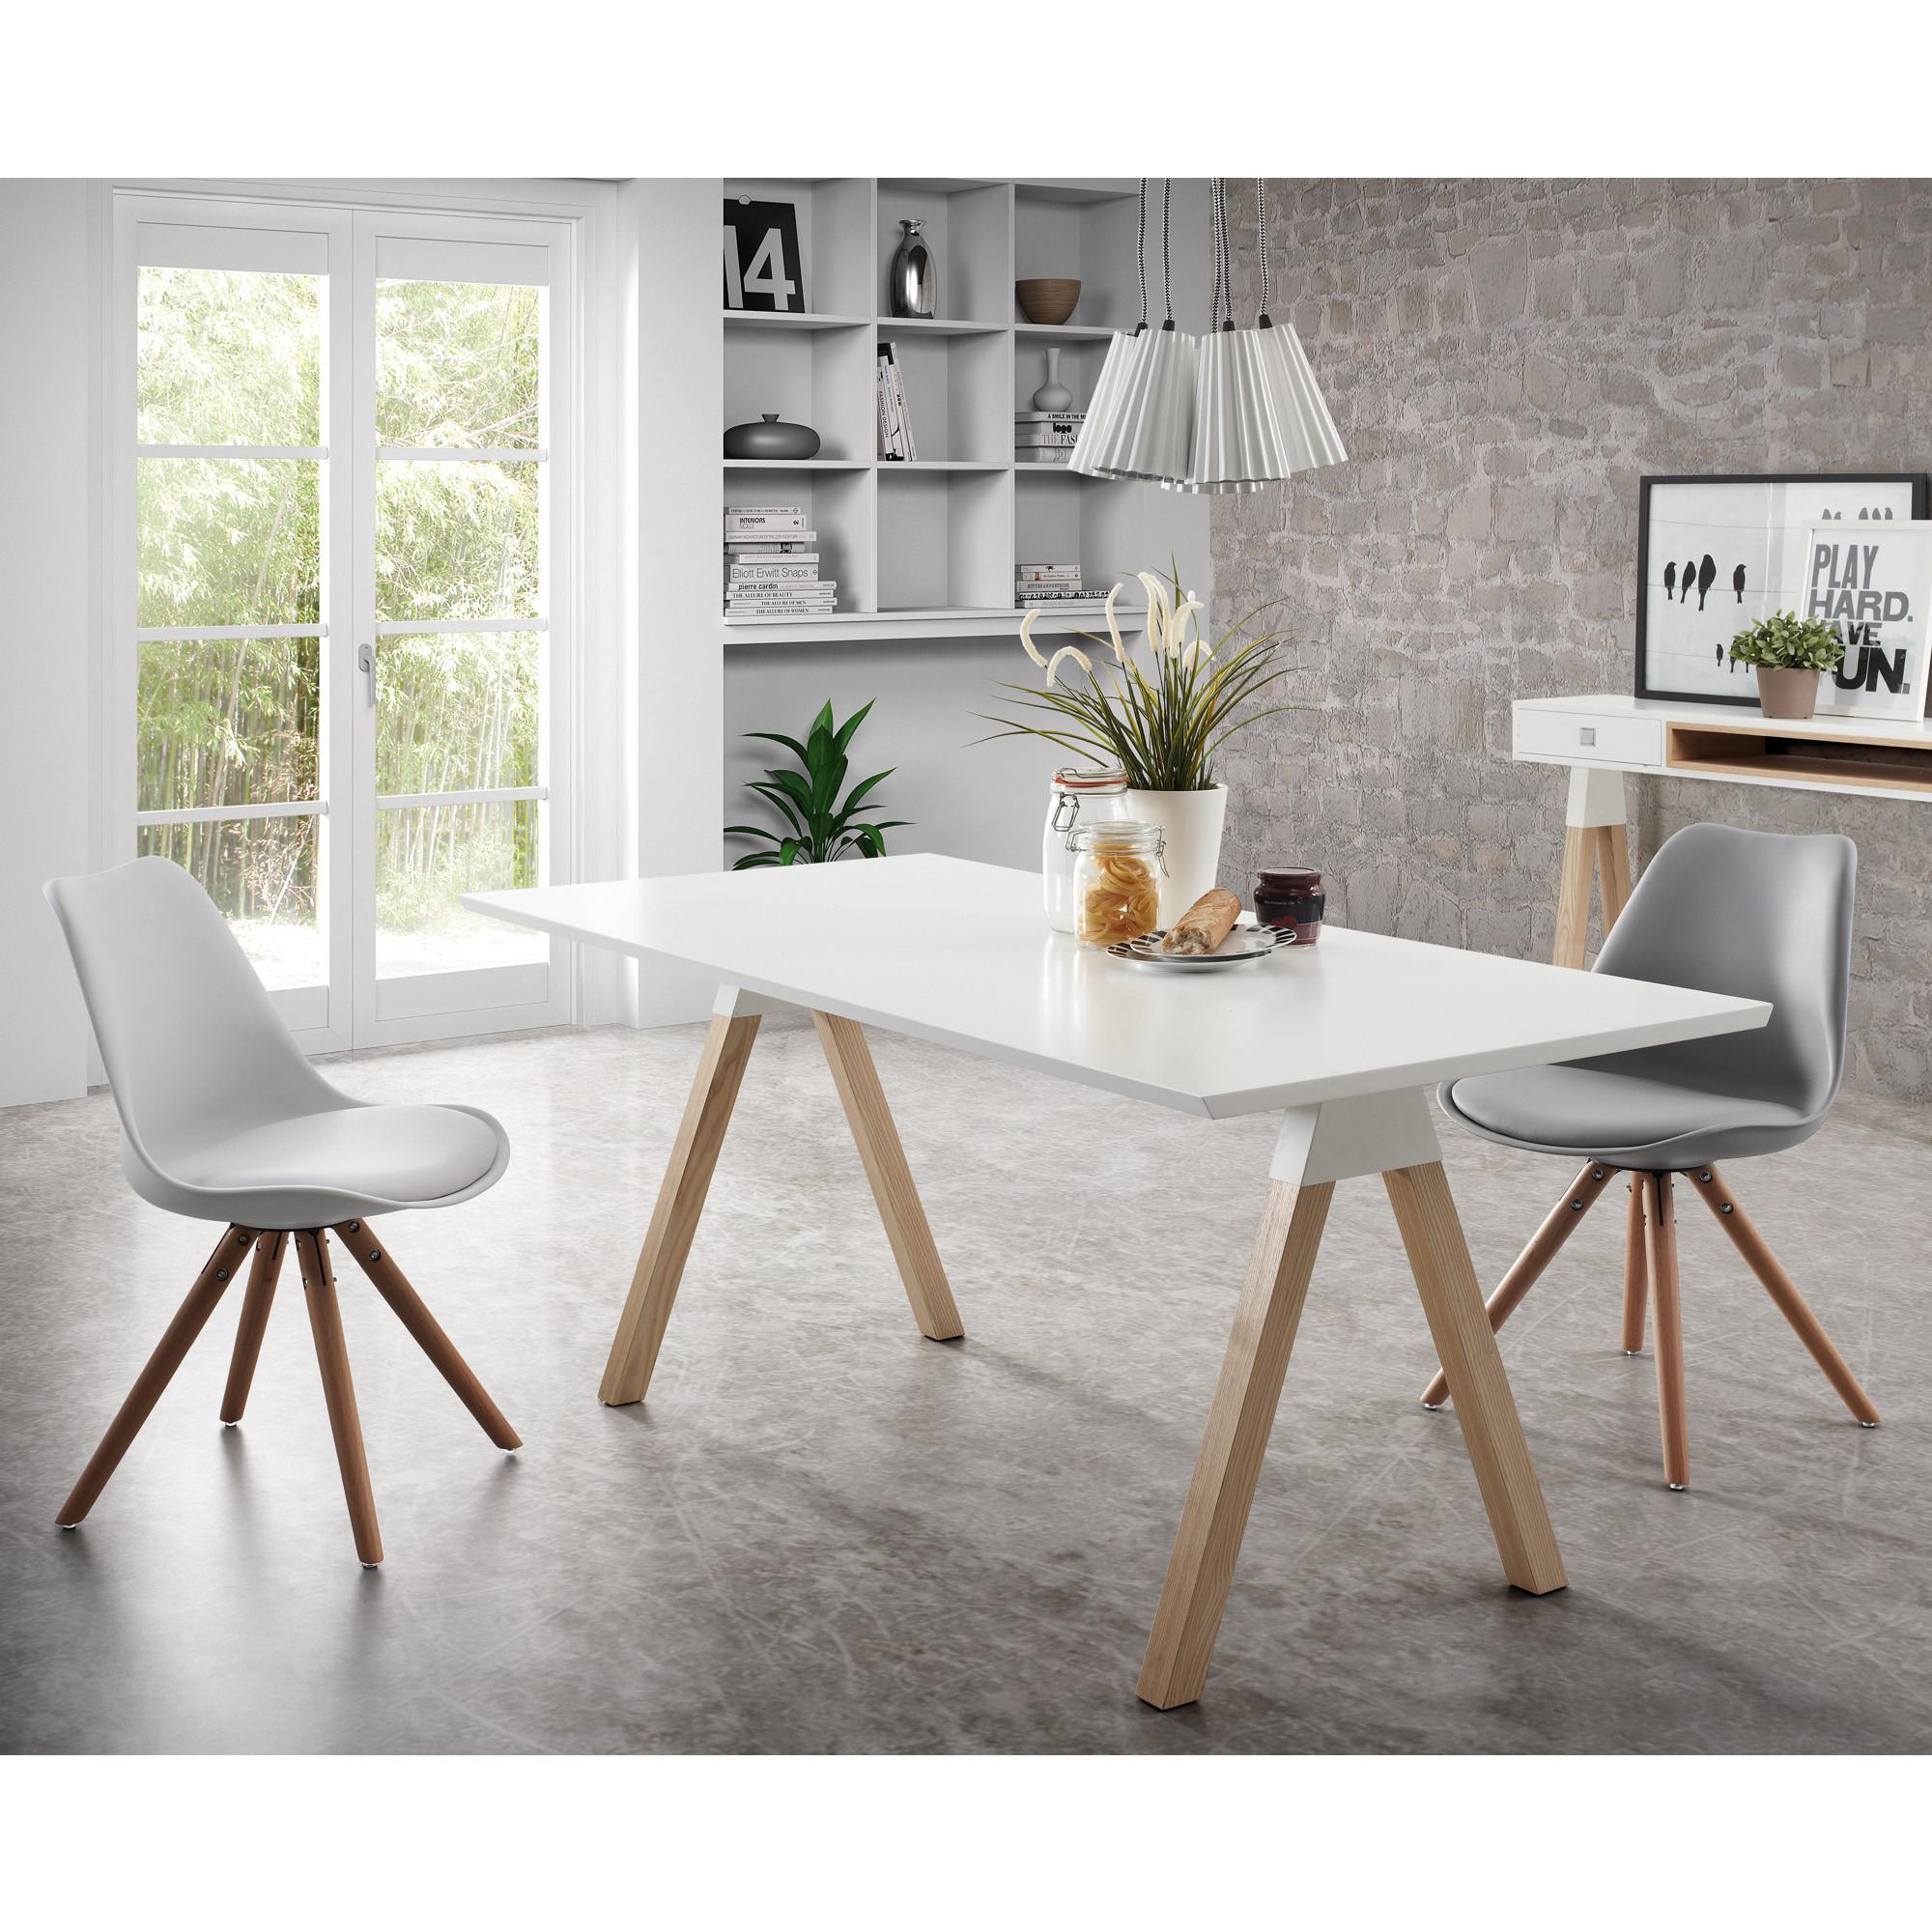 Chair Lars   White & Wood